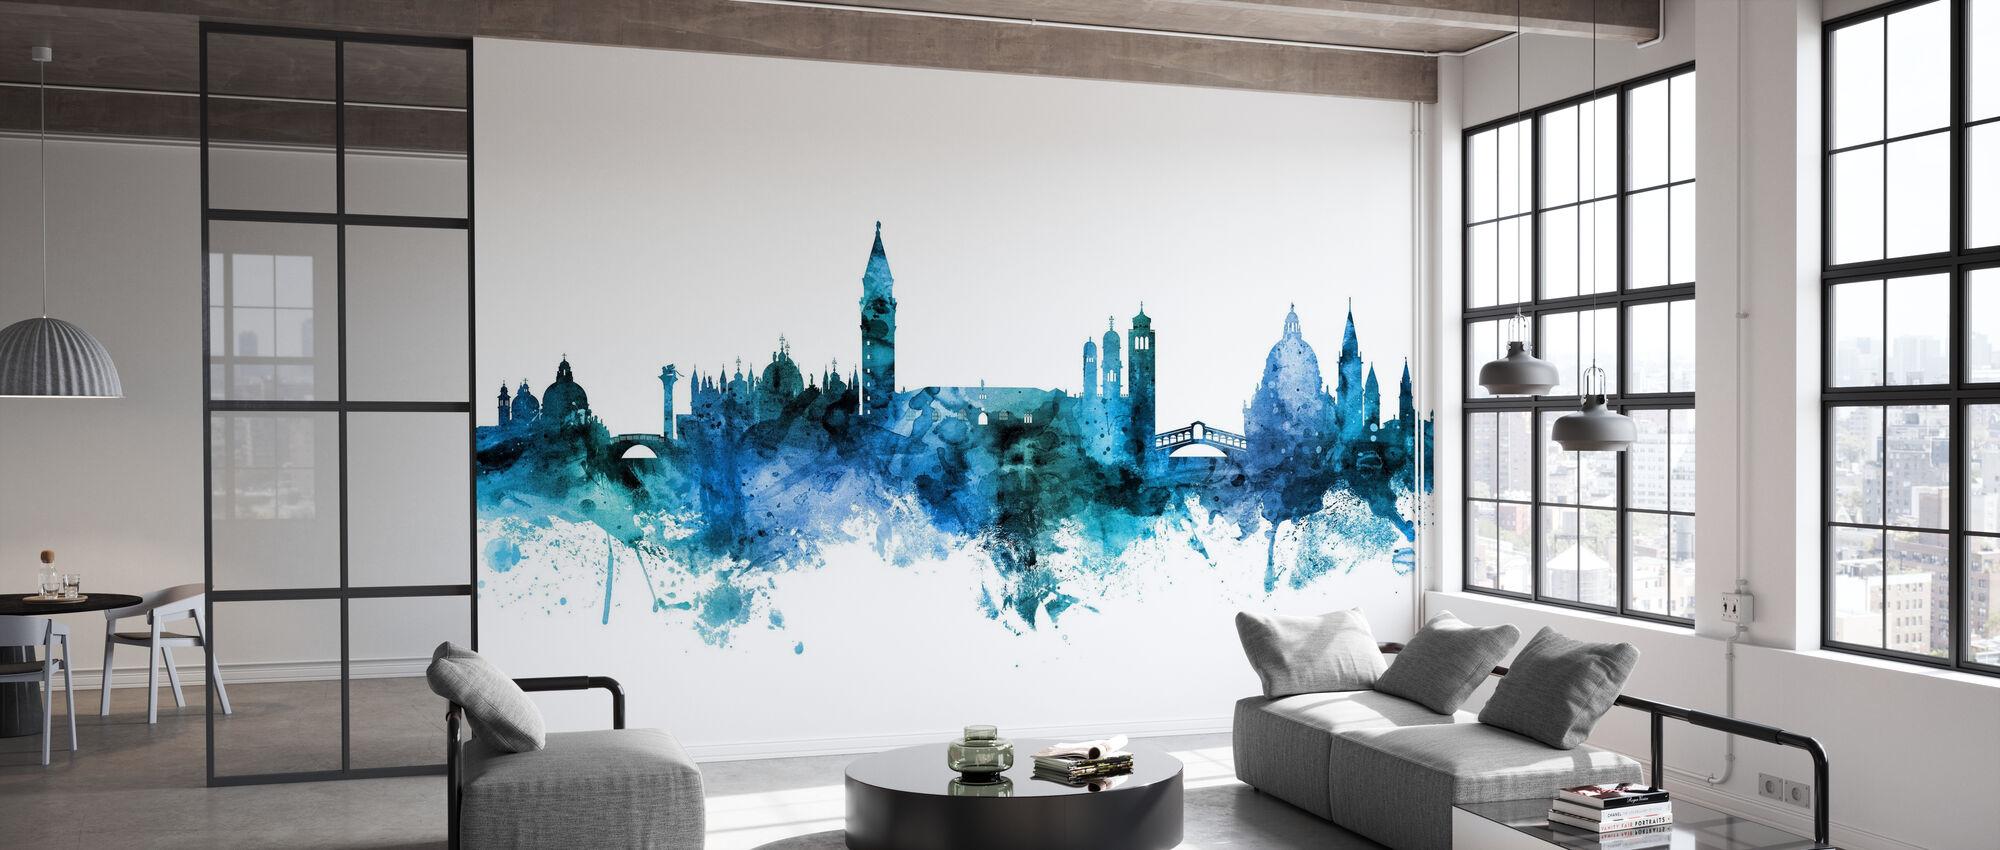 Venice Italy Skyline - Wallpaper - Office